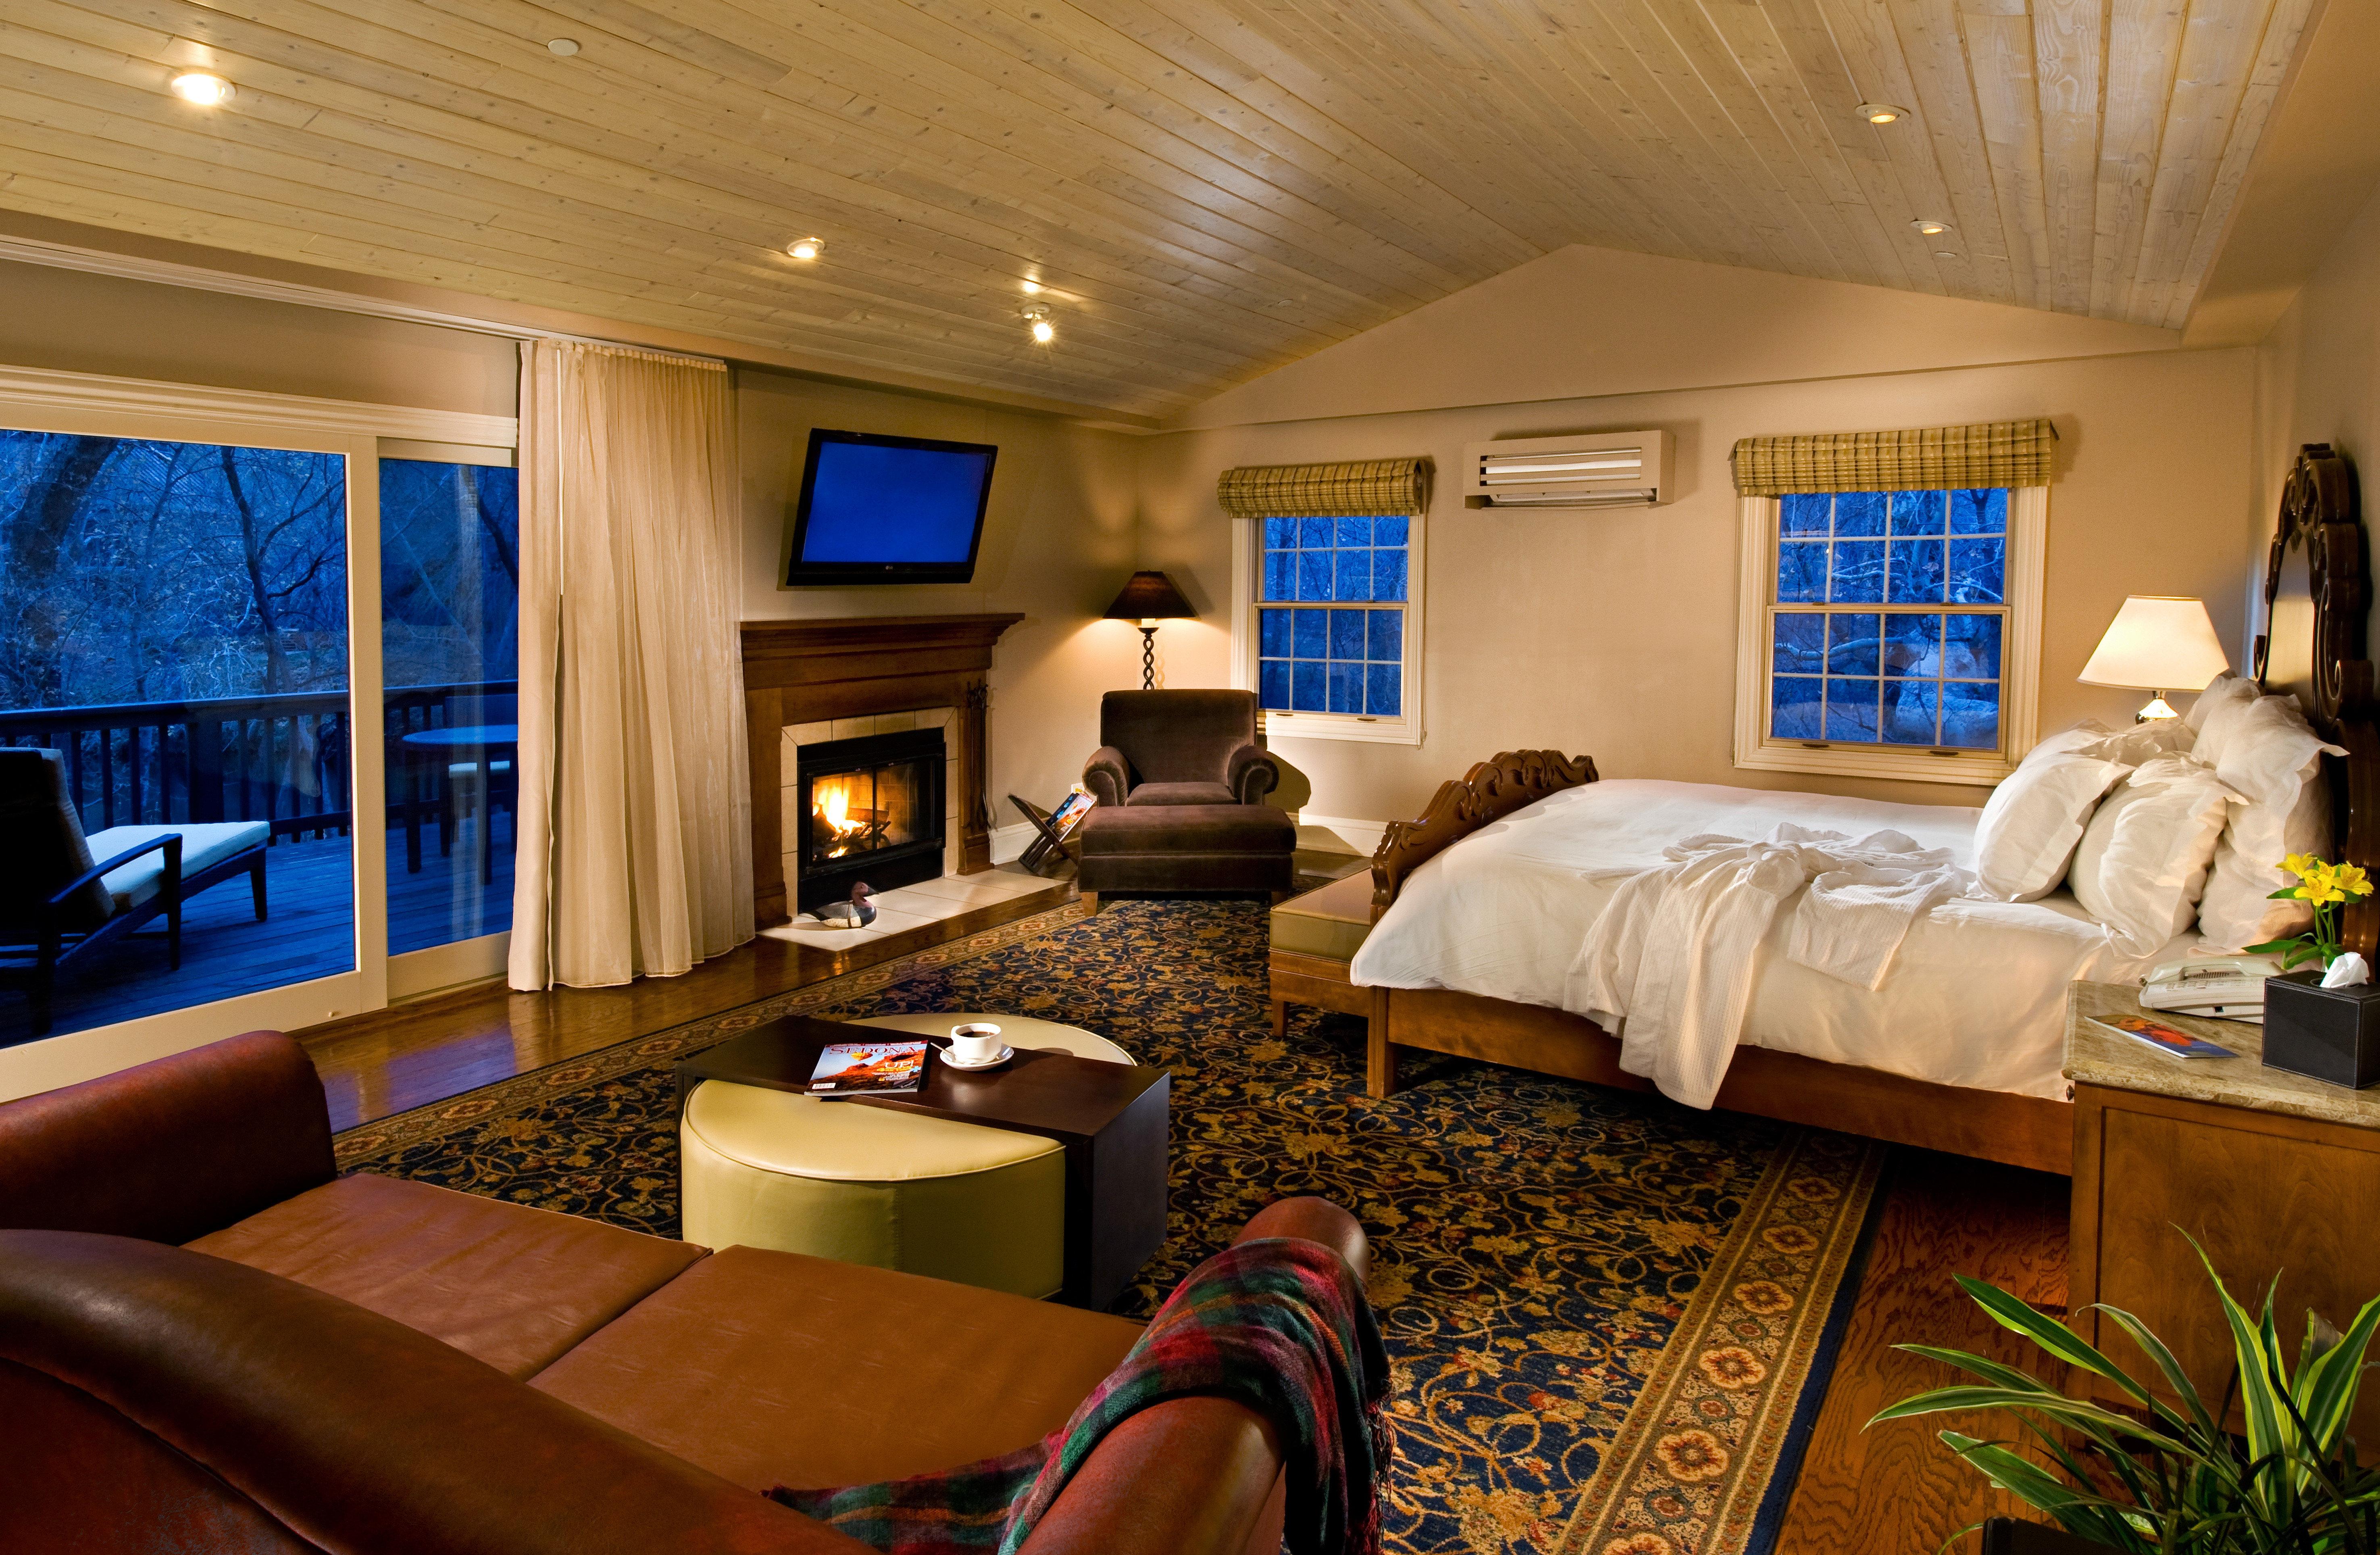 Bedroom Luxury Romance Romantic property living room home recreation room Suite cottage